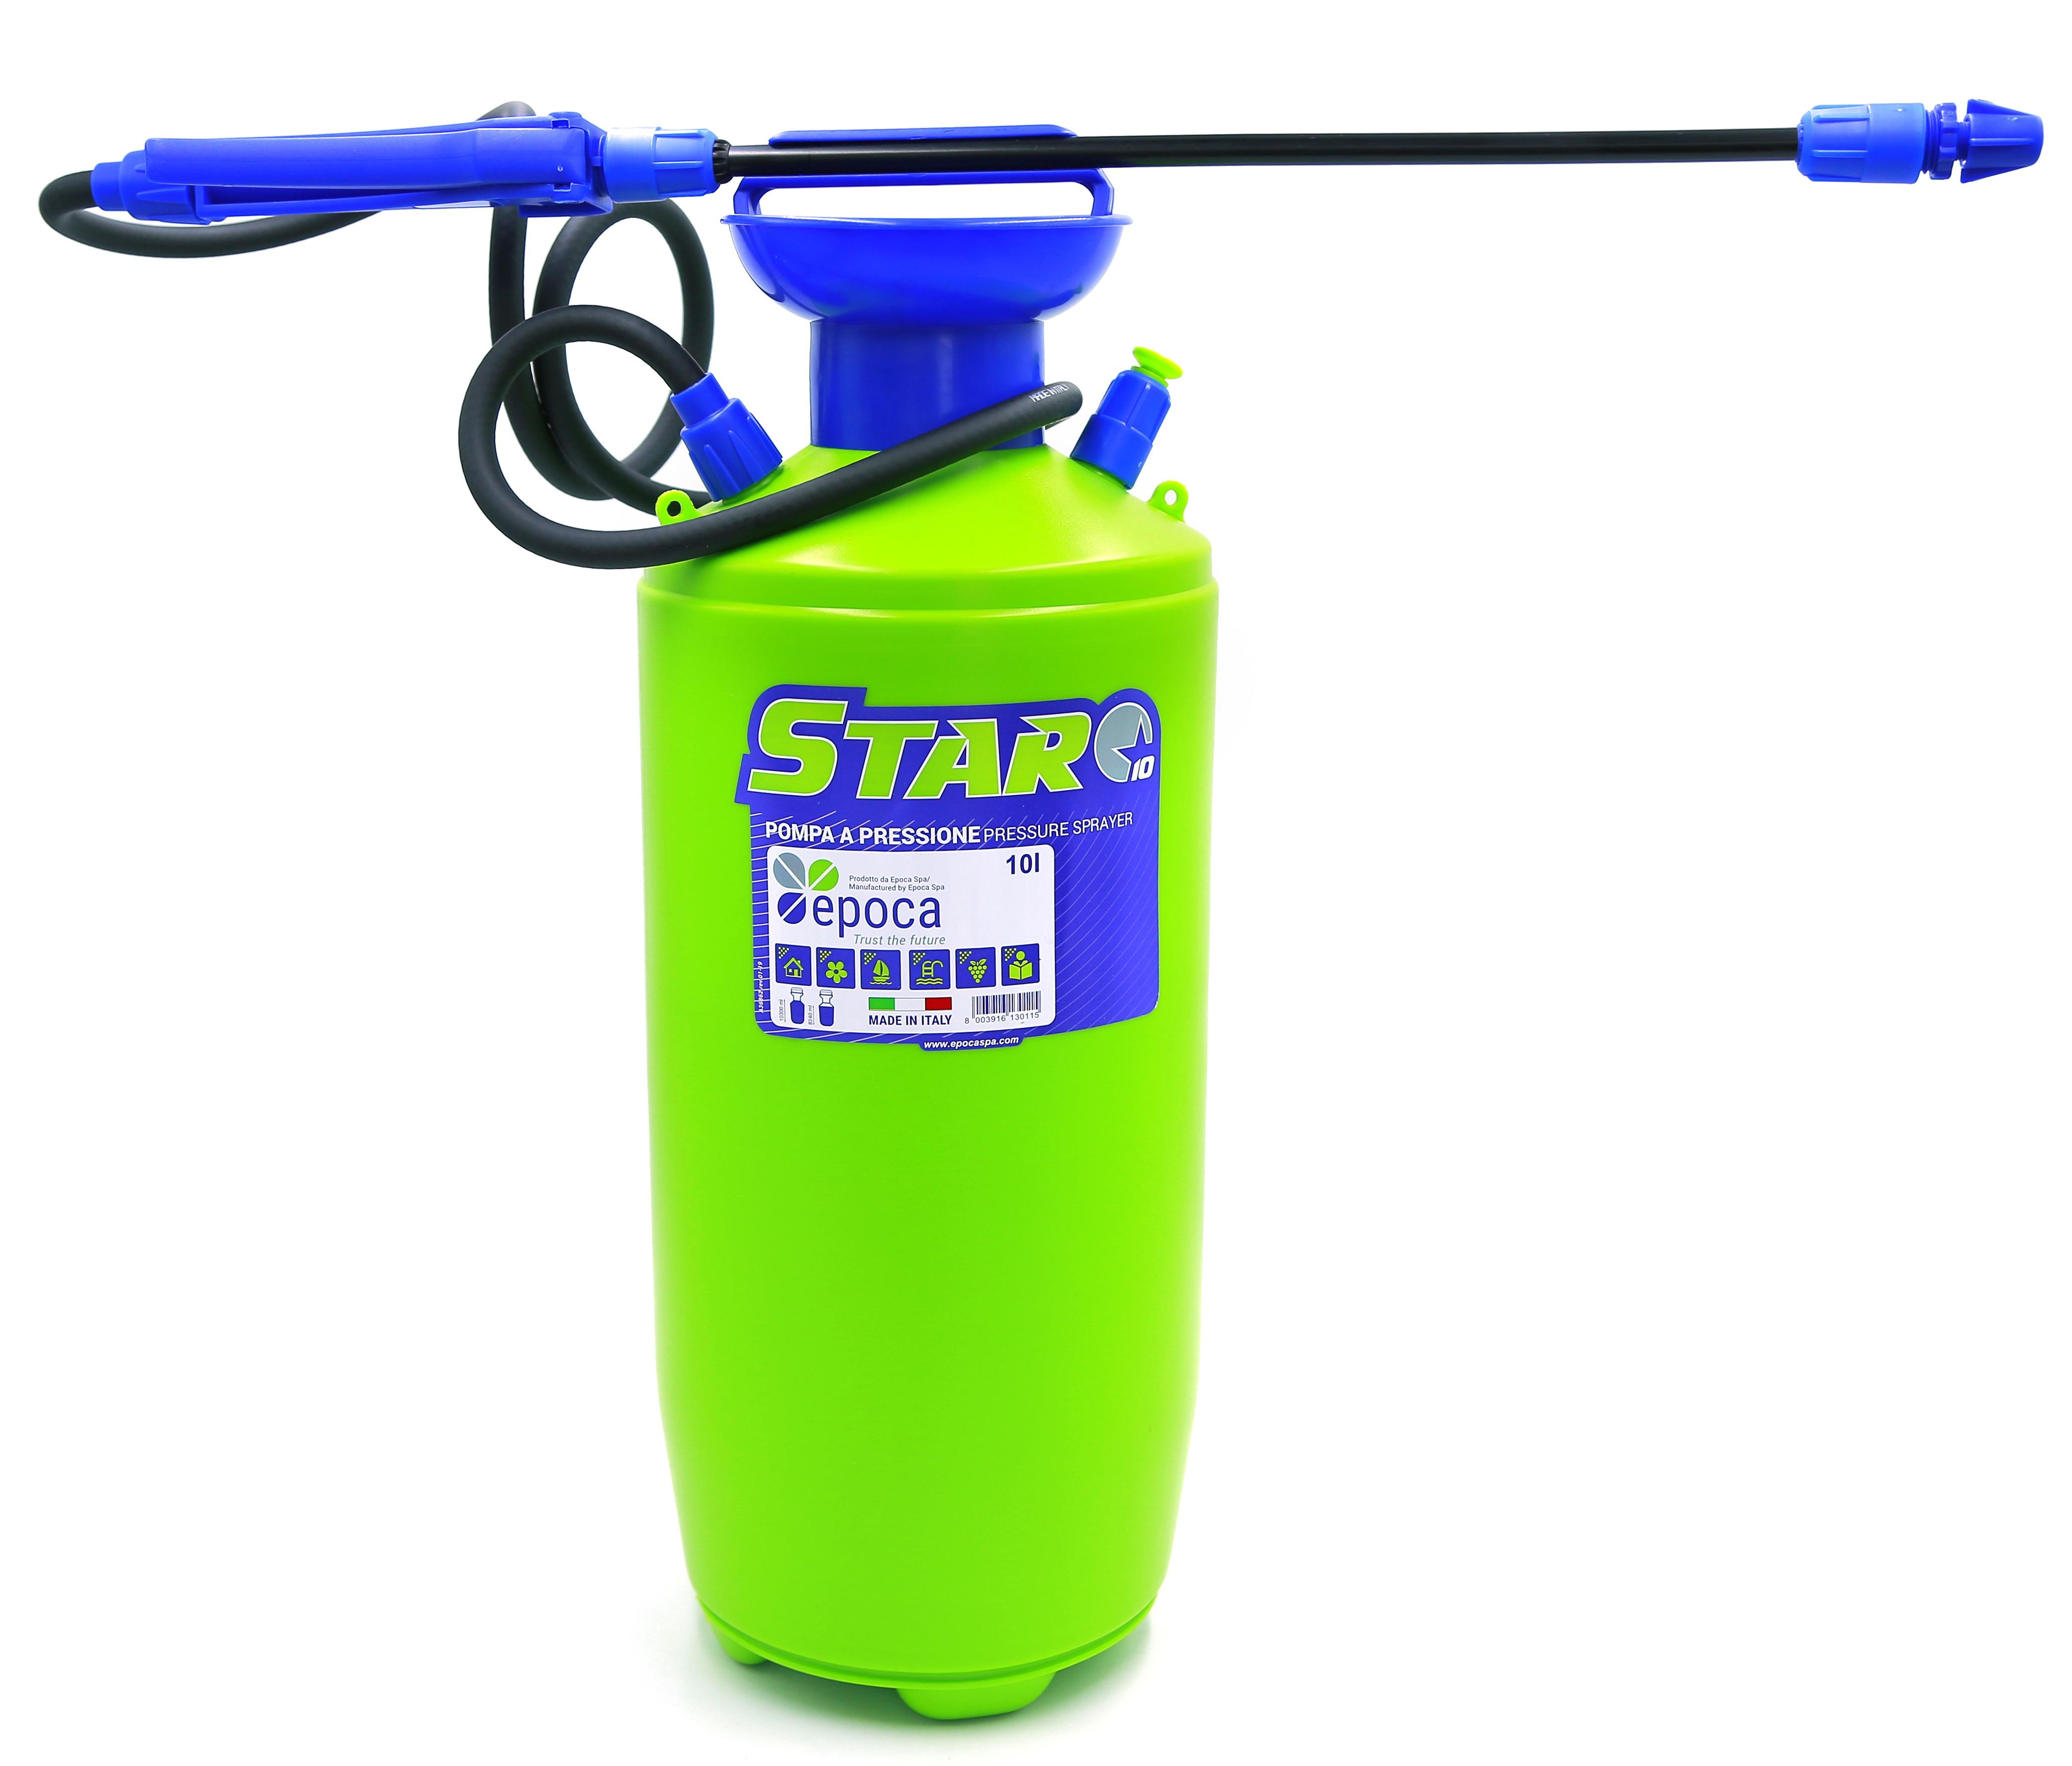 Italy Pressure Sprayer Star 10 Ltr (Epoca)